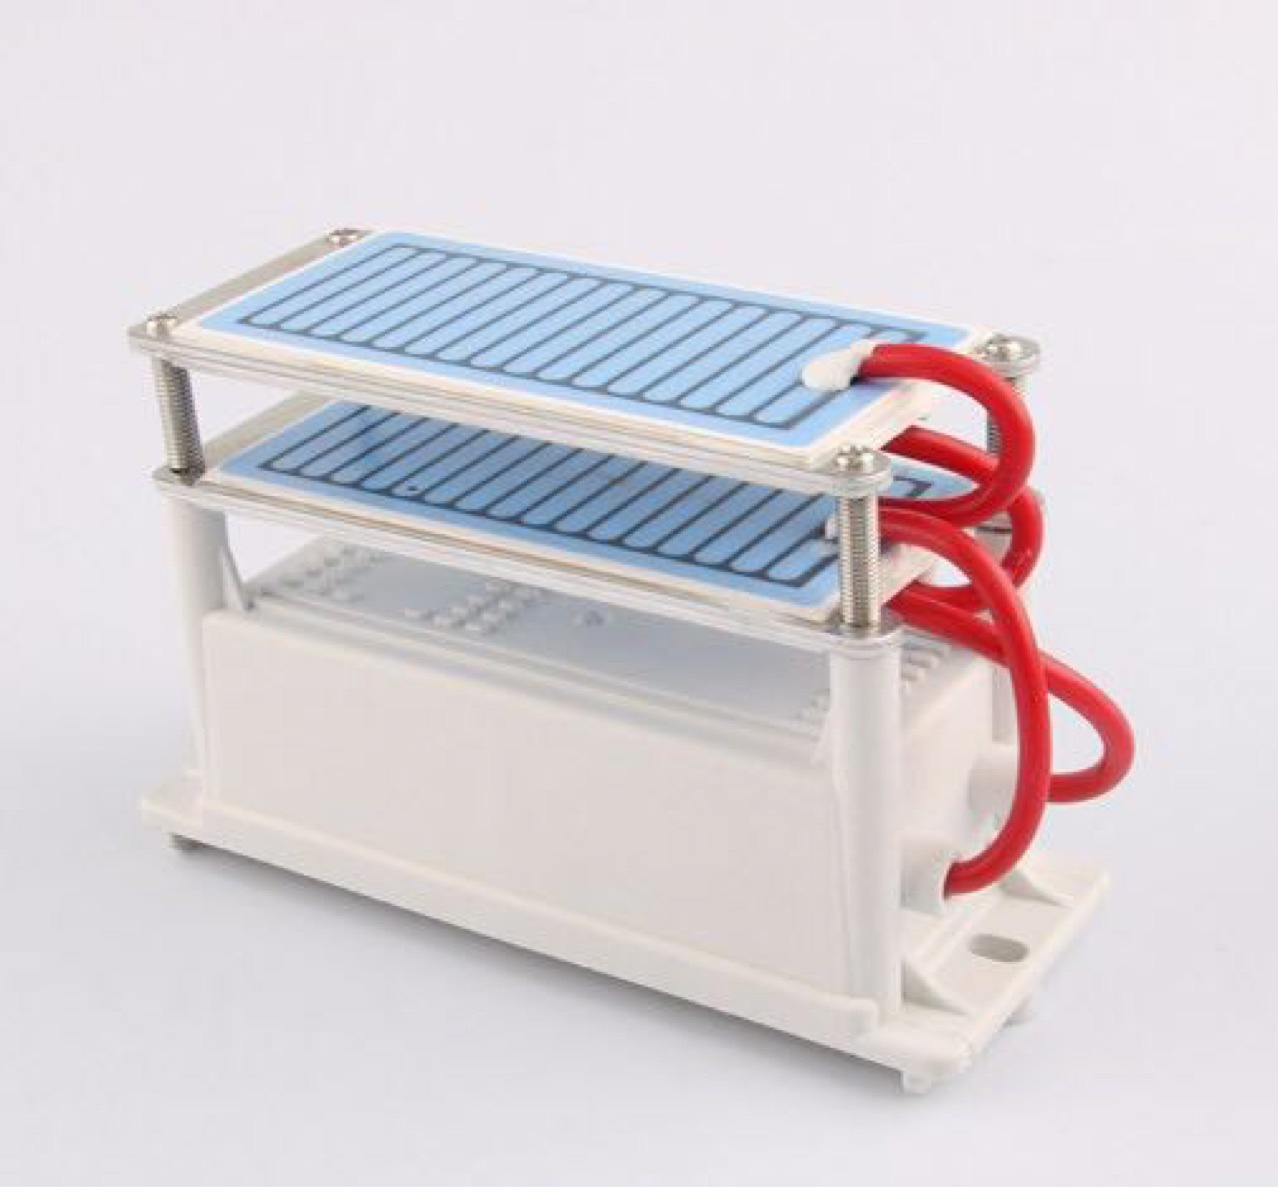 24g Ozone Generator 220V Portable Ozonizer Air Water Purifier Sterilizer Treatment Long Life Removal 220V Air Purifier